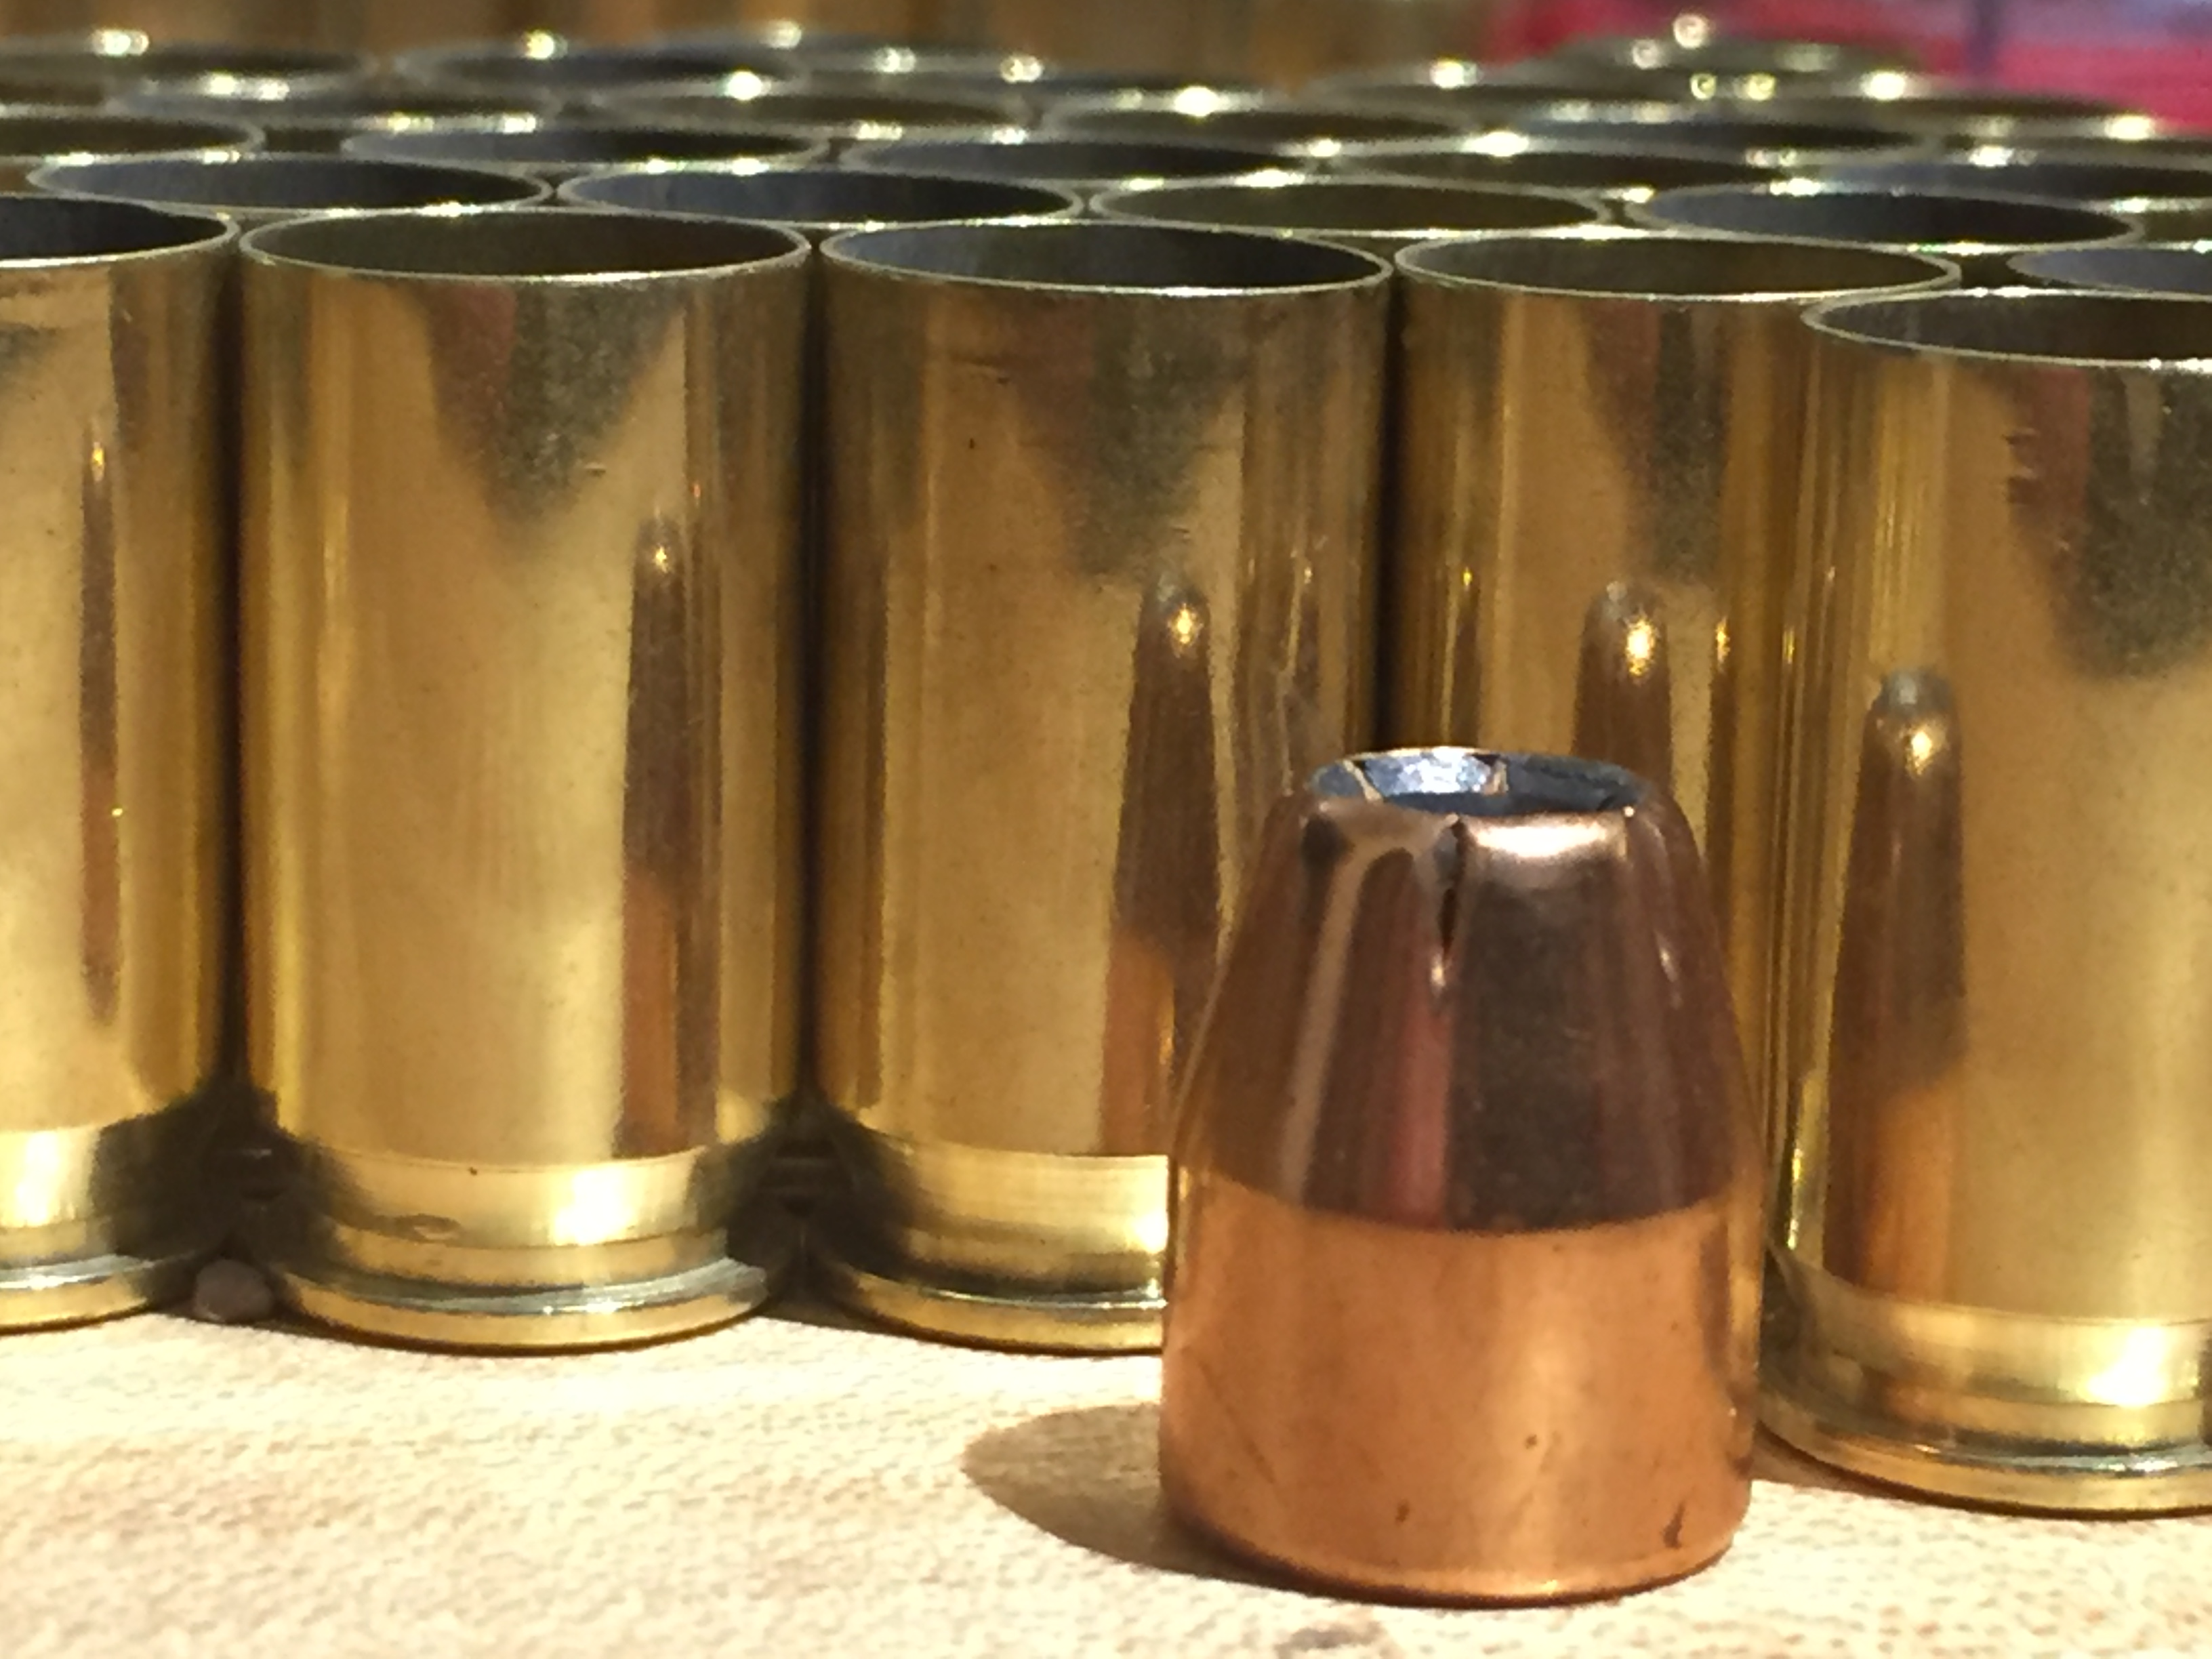 The 45 ACP Cartridge